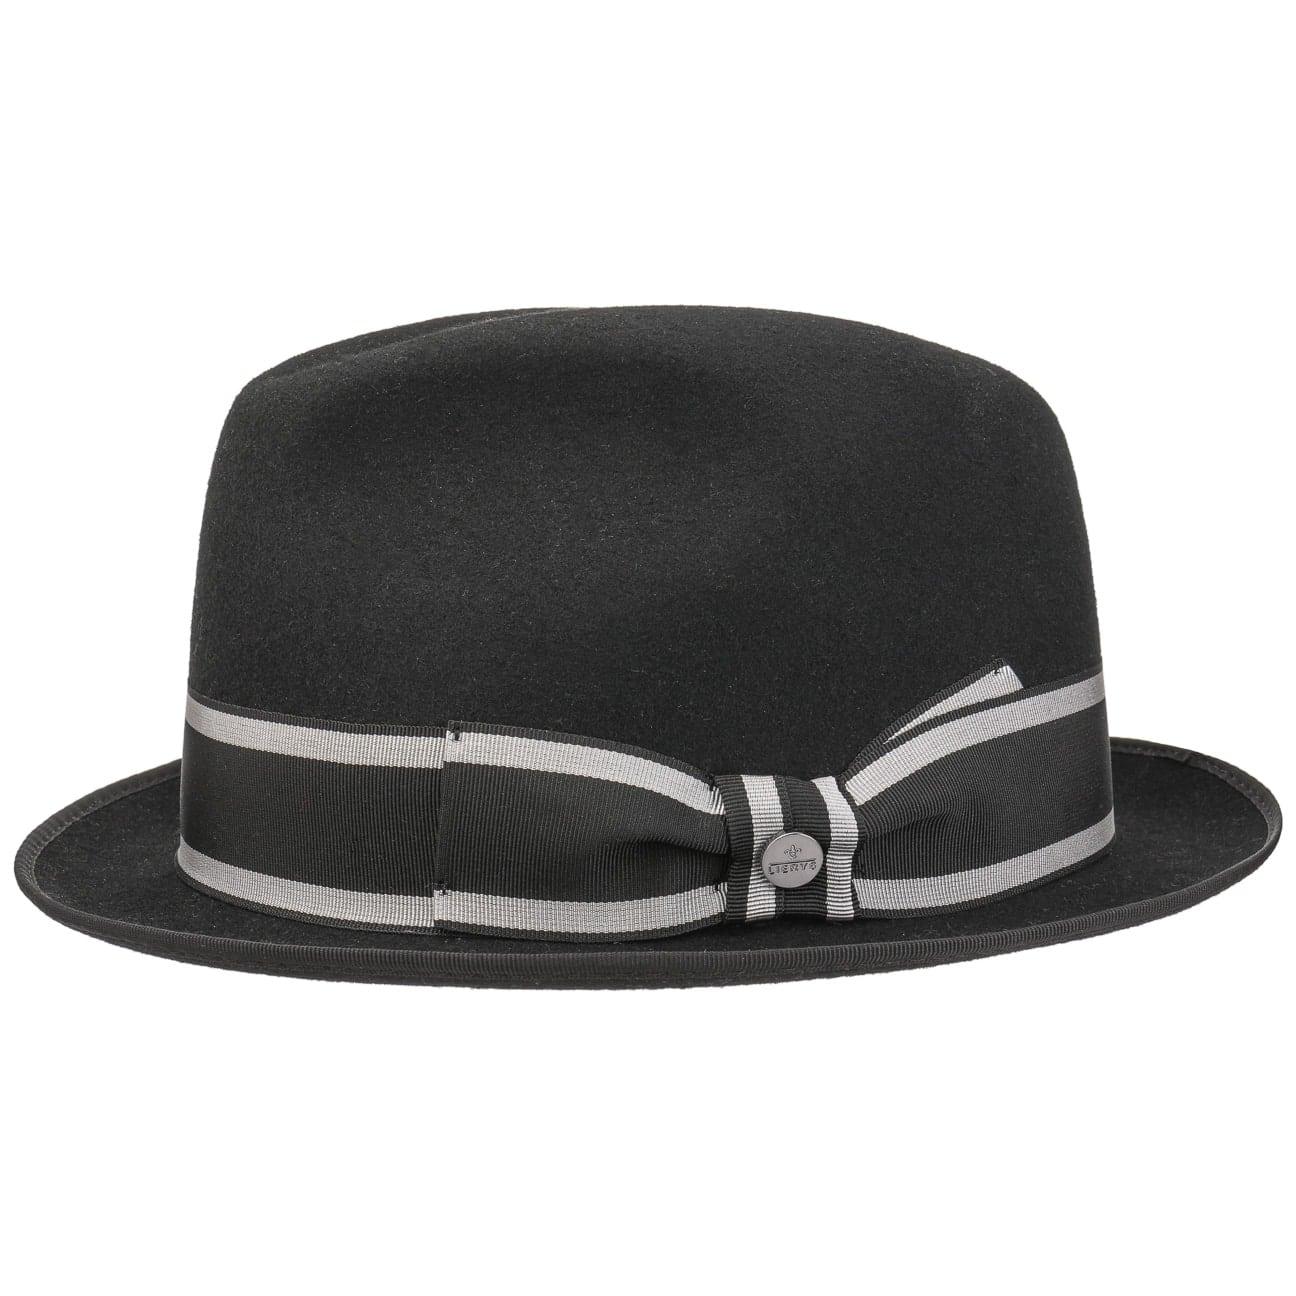 Tyco Crushable Player Wool Felt Hat by Lierys  felt hat